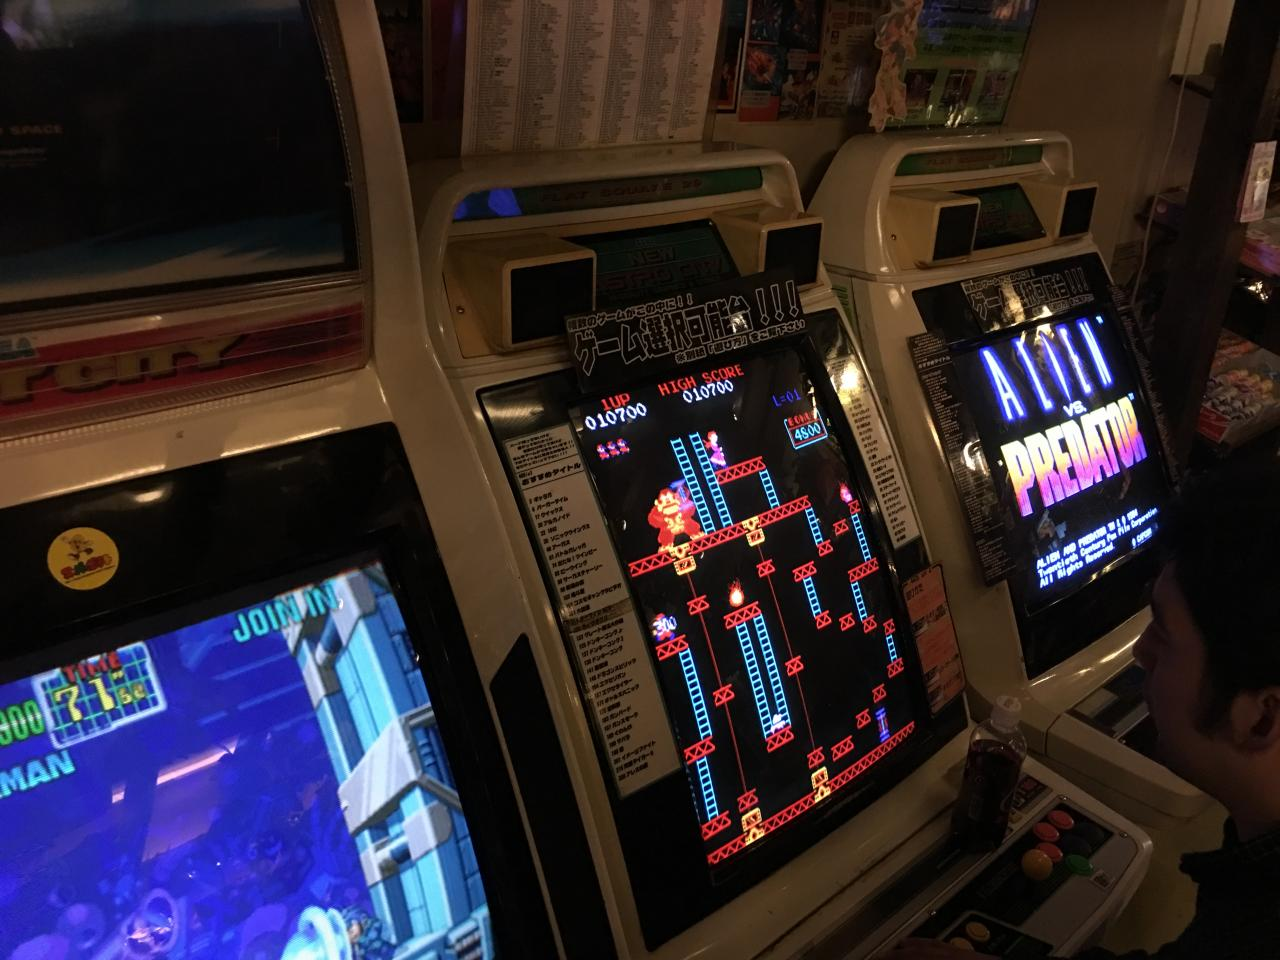 160911_28827_arcade_retro_1_1280_960.JPG